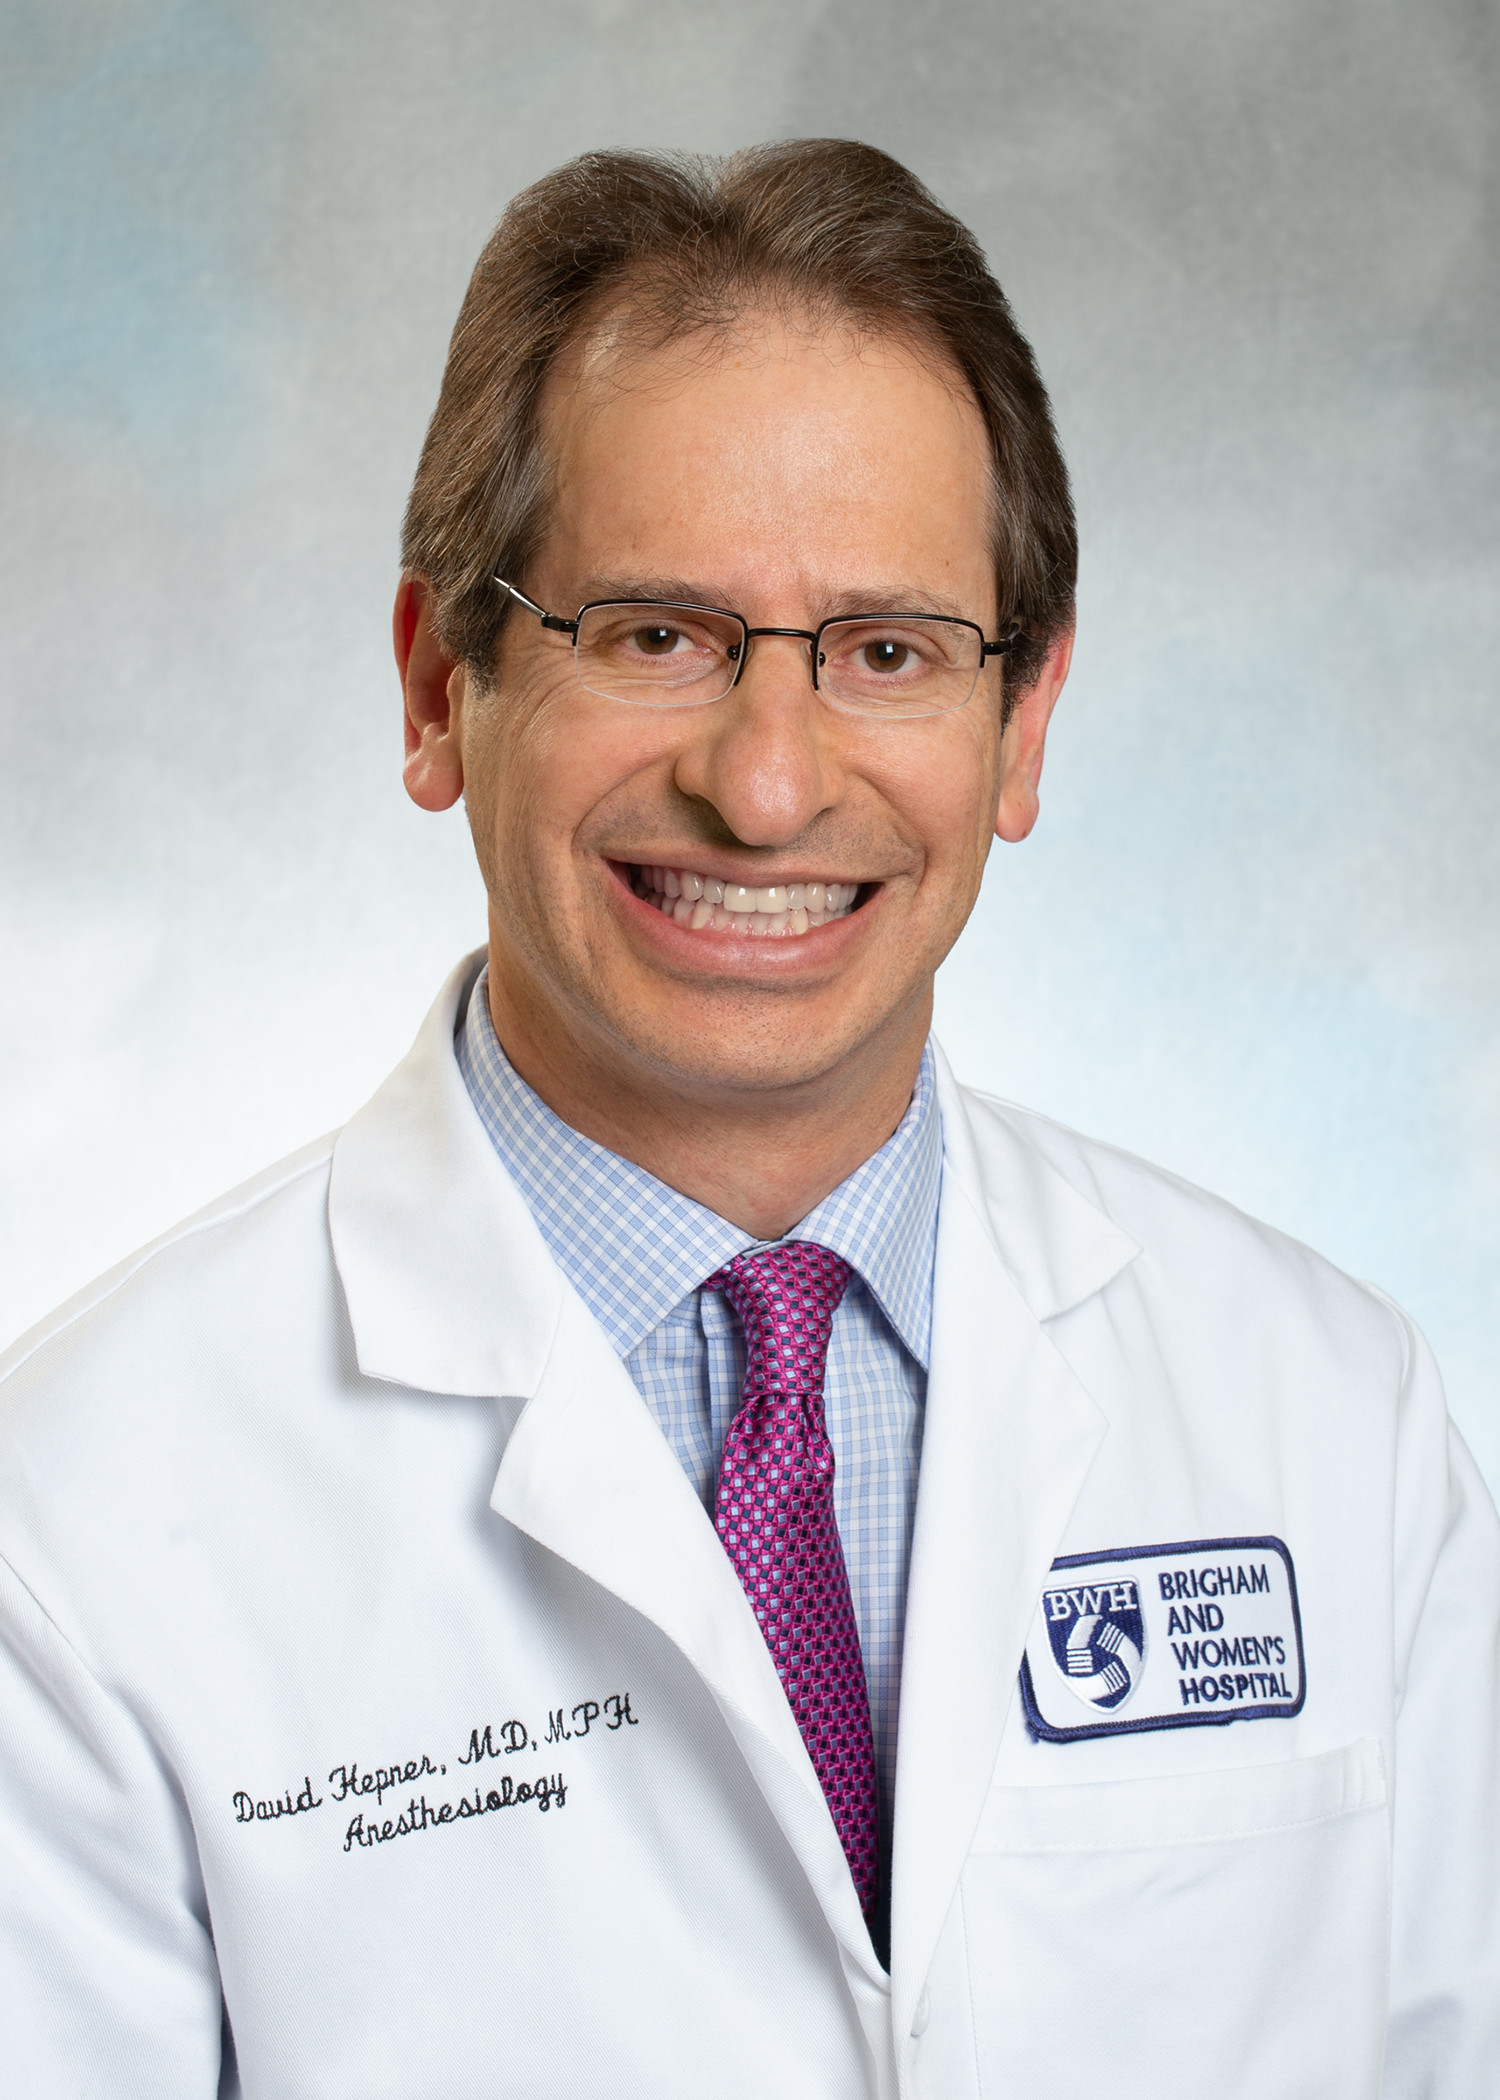 David Hepner, MD, MPH's avatar